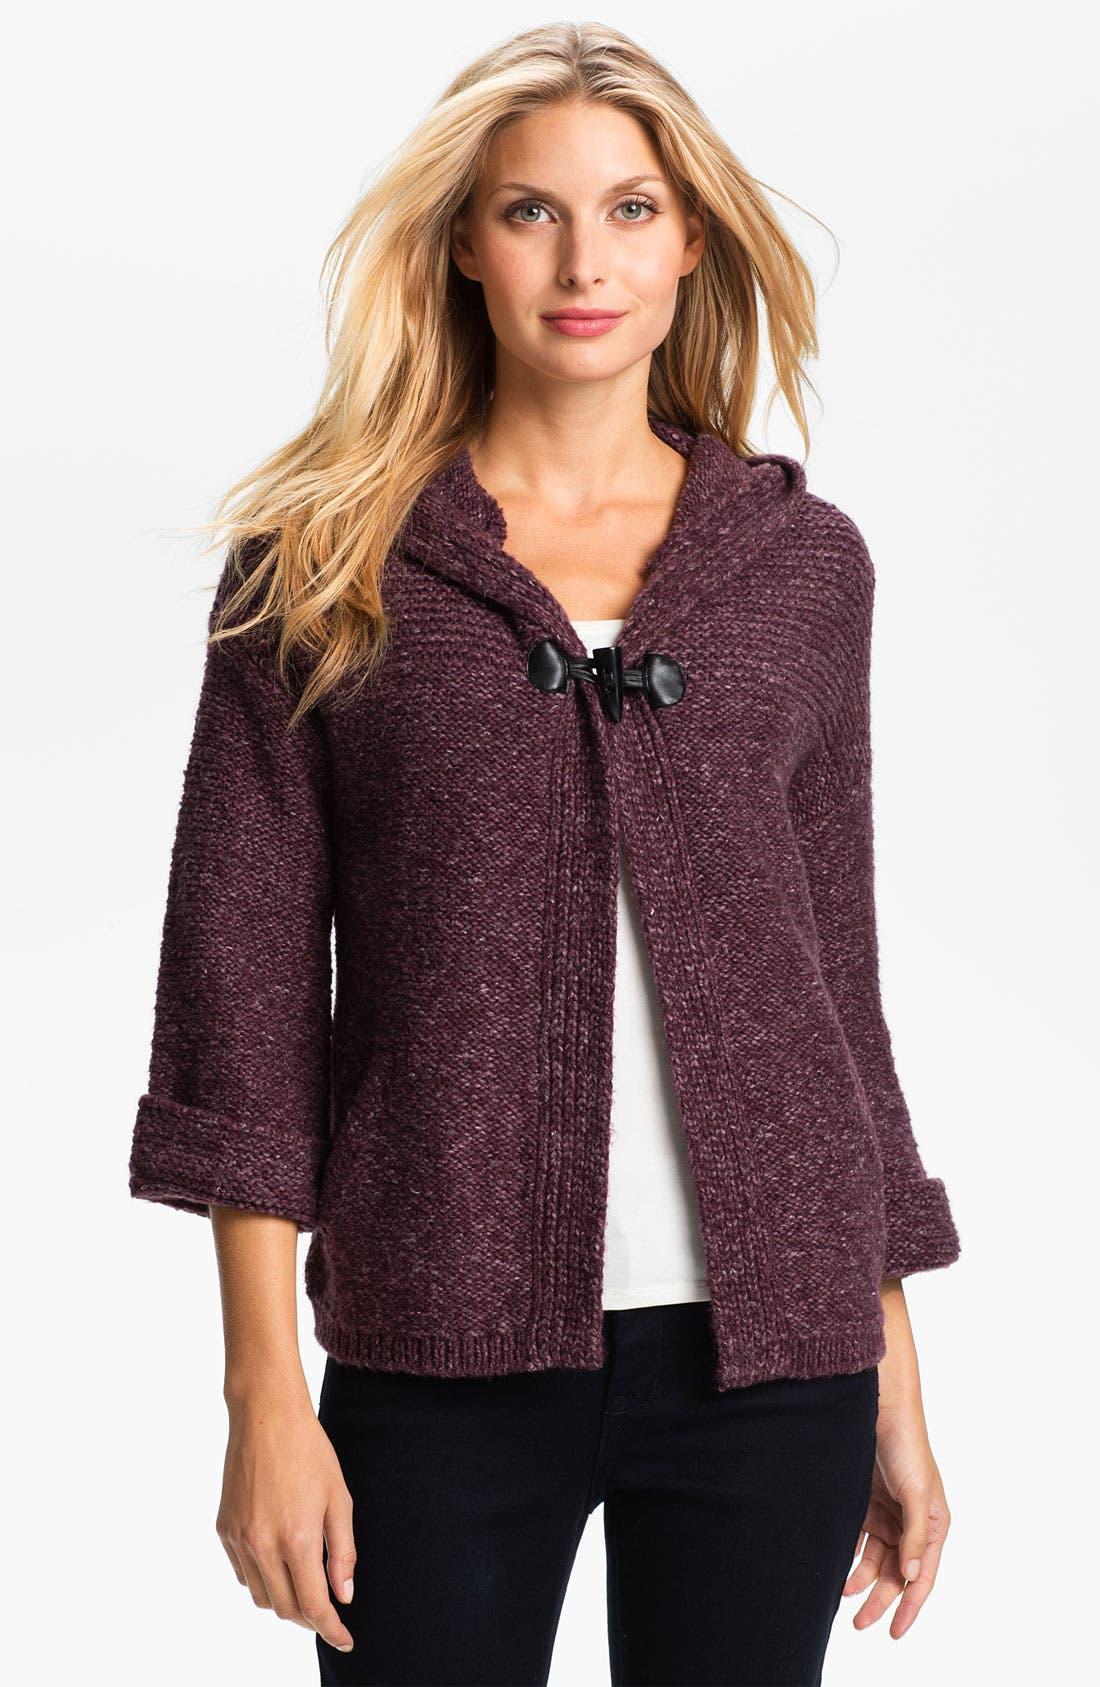 Main Image - Amber Sun Hooded Sweater Jacket